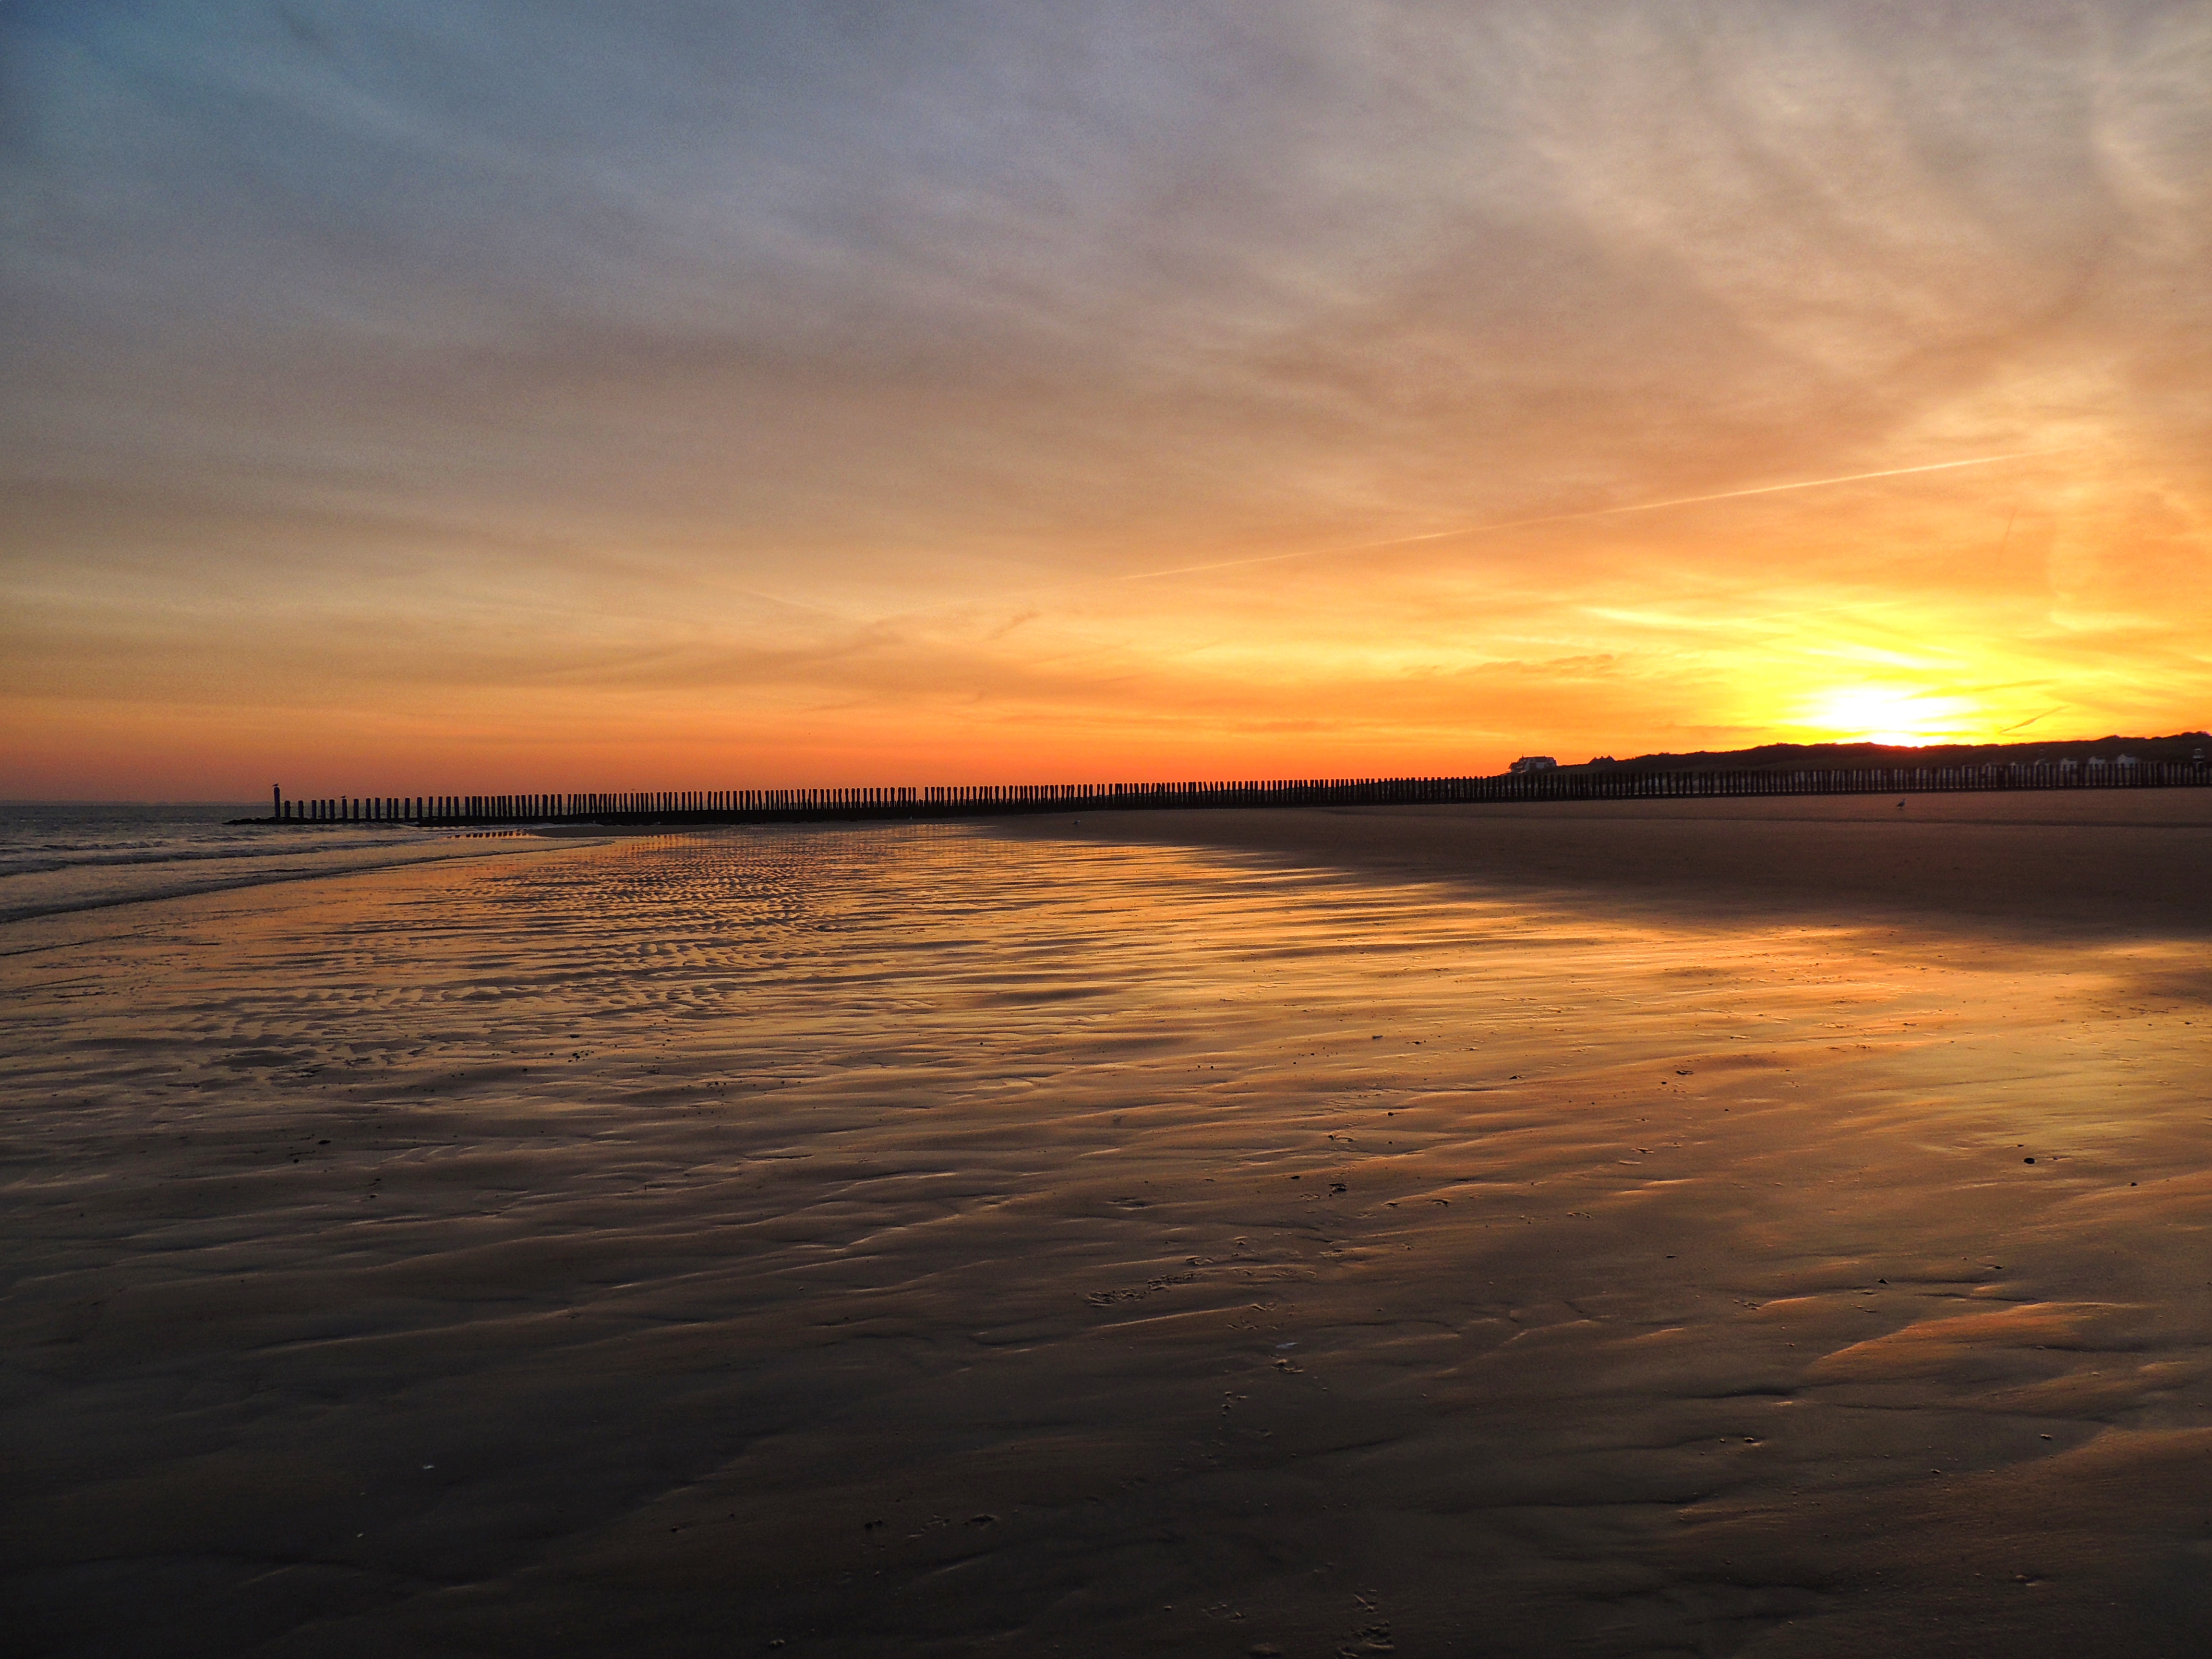 Beautiful sunset at the beach.